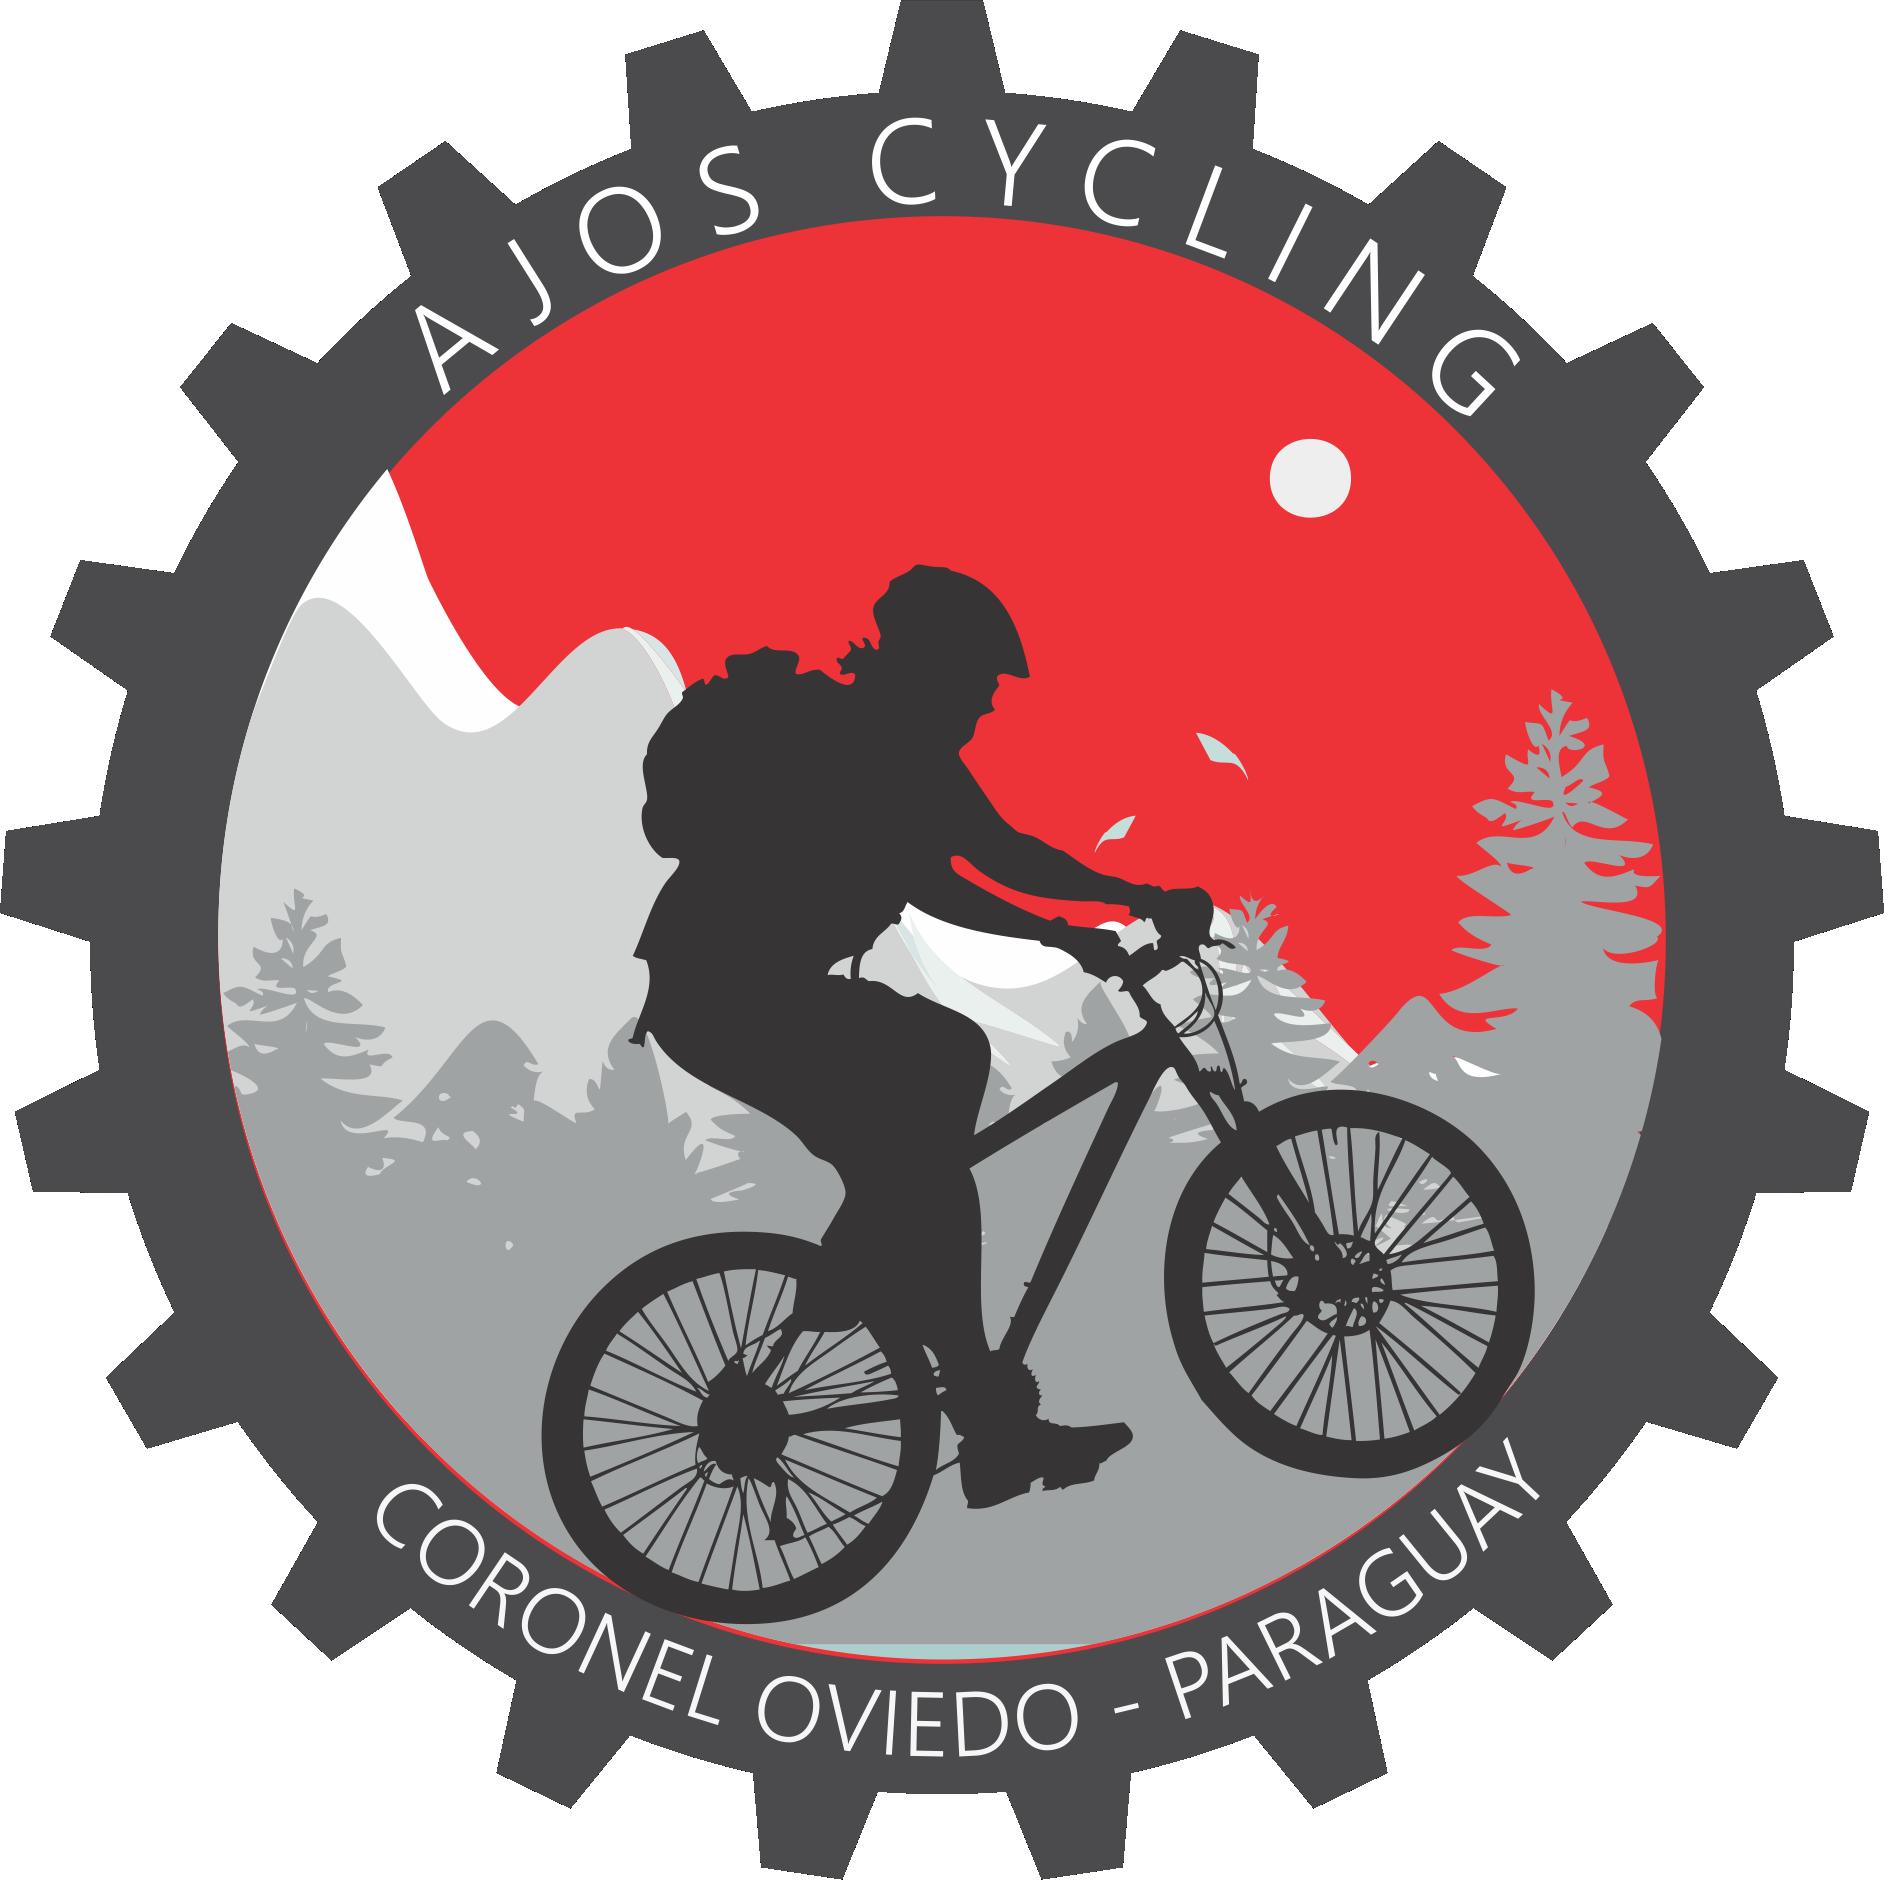 Club Ciclista Ajos Cycling